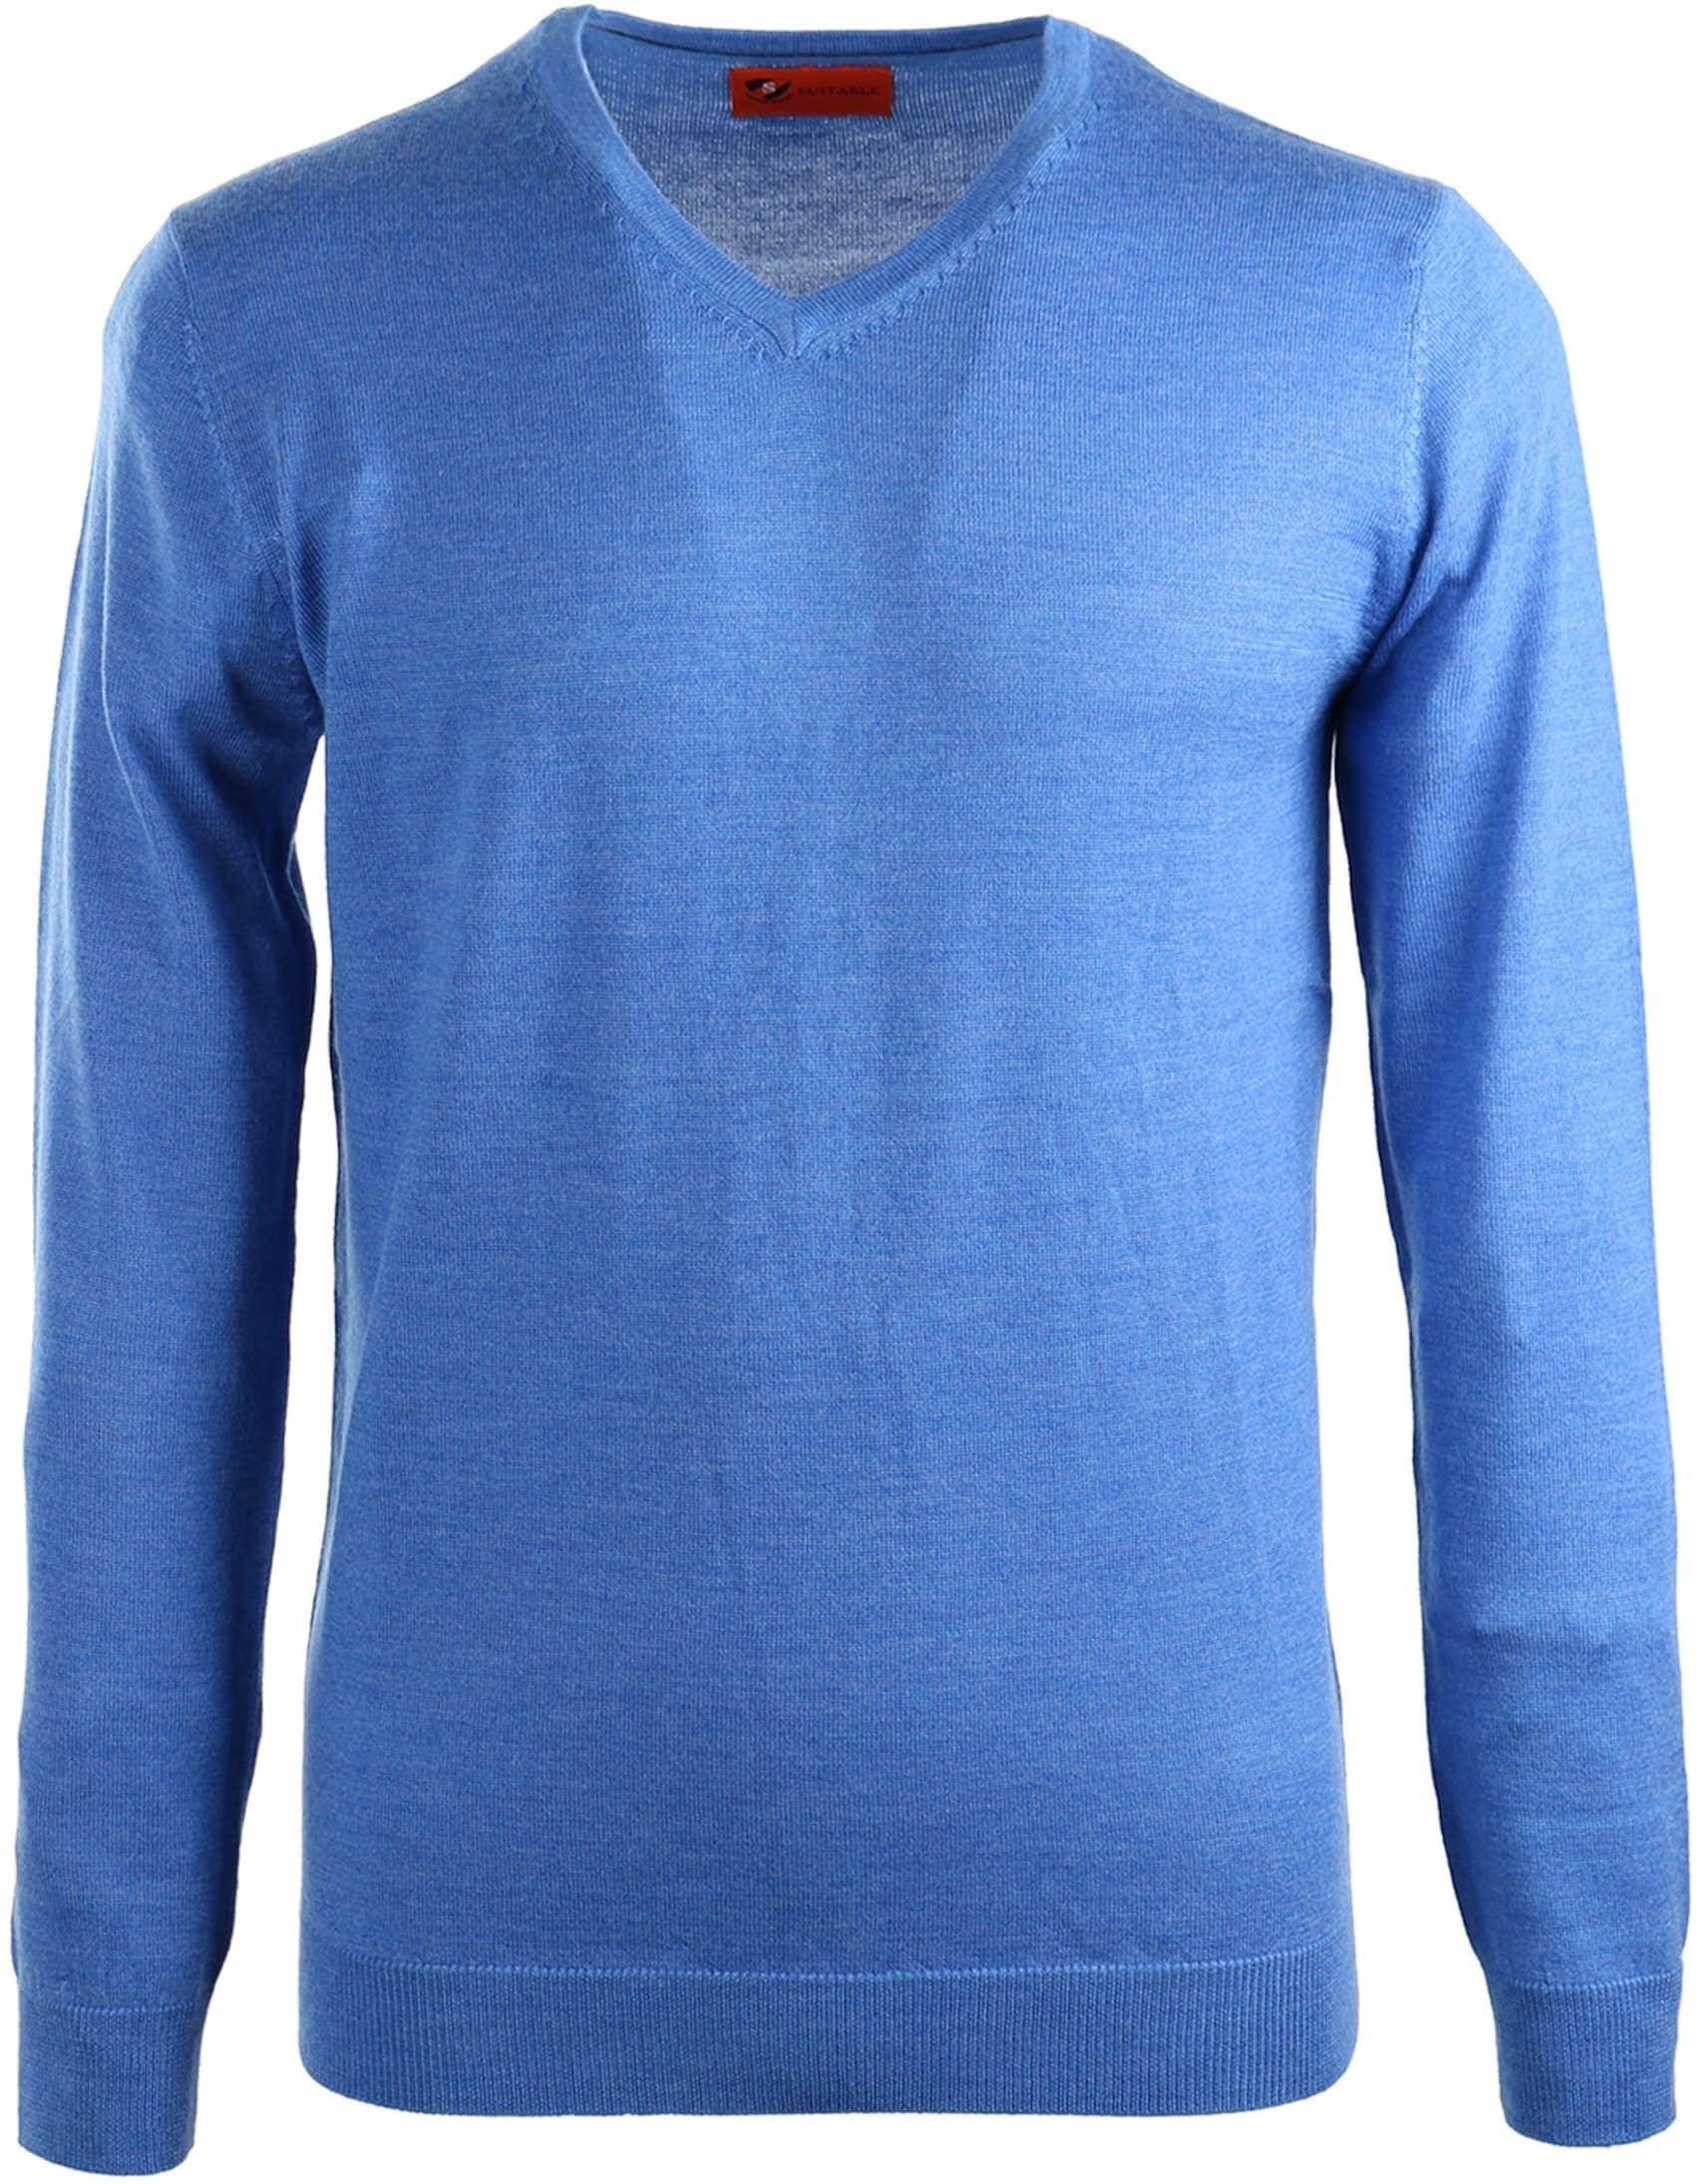 Suitable Pullover Merino Wol Blauw foto 0